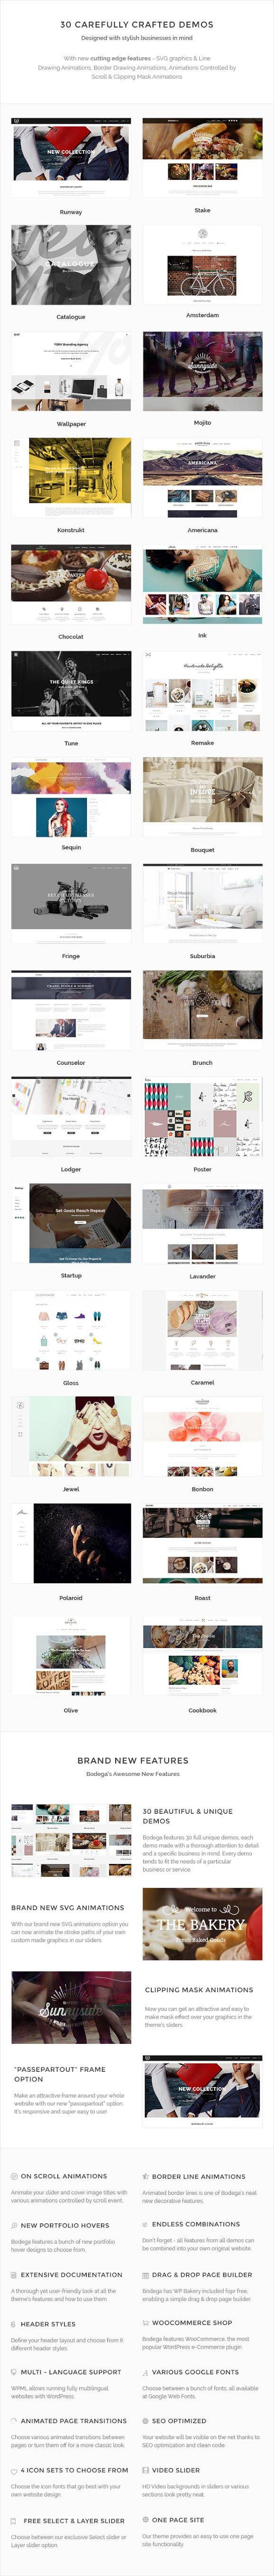 Small Business Wordpress Theme - Bodega